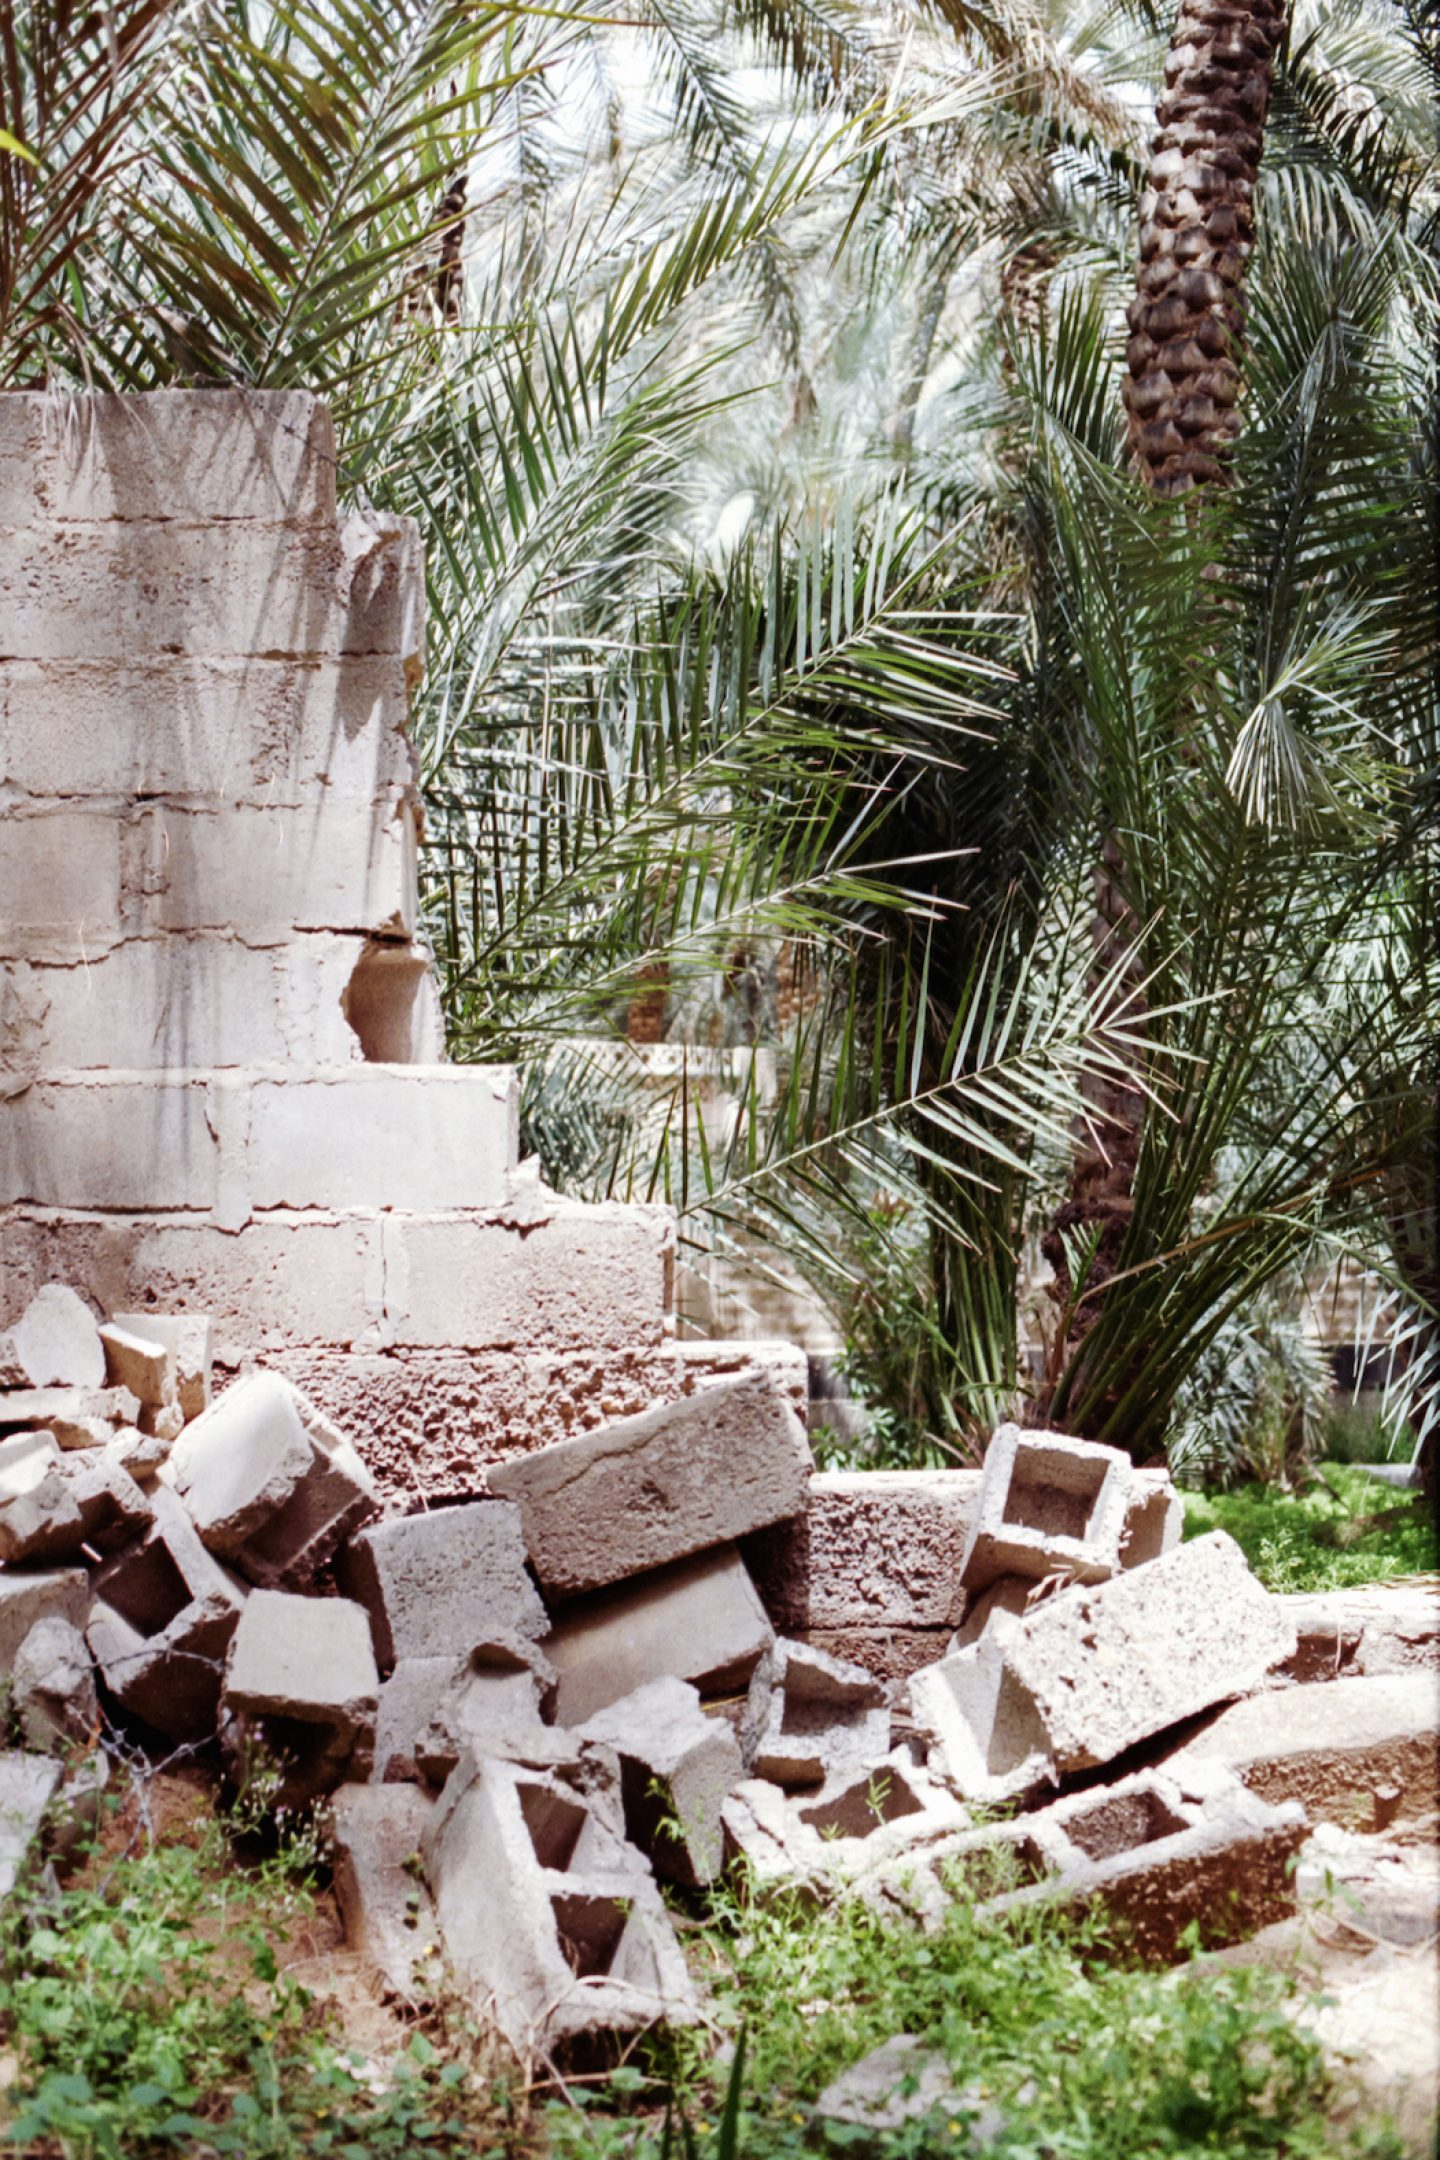 Silvia-Conde-Abu-Dhabi-52